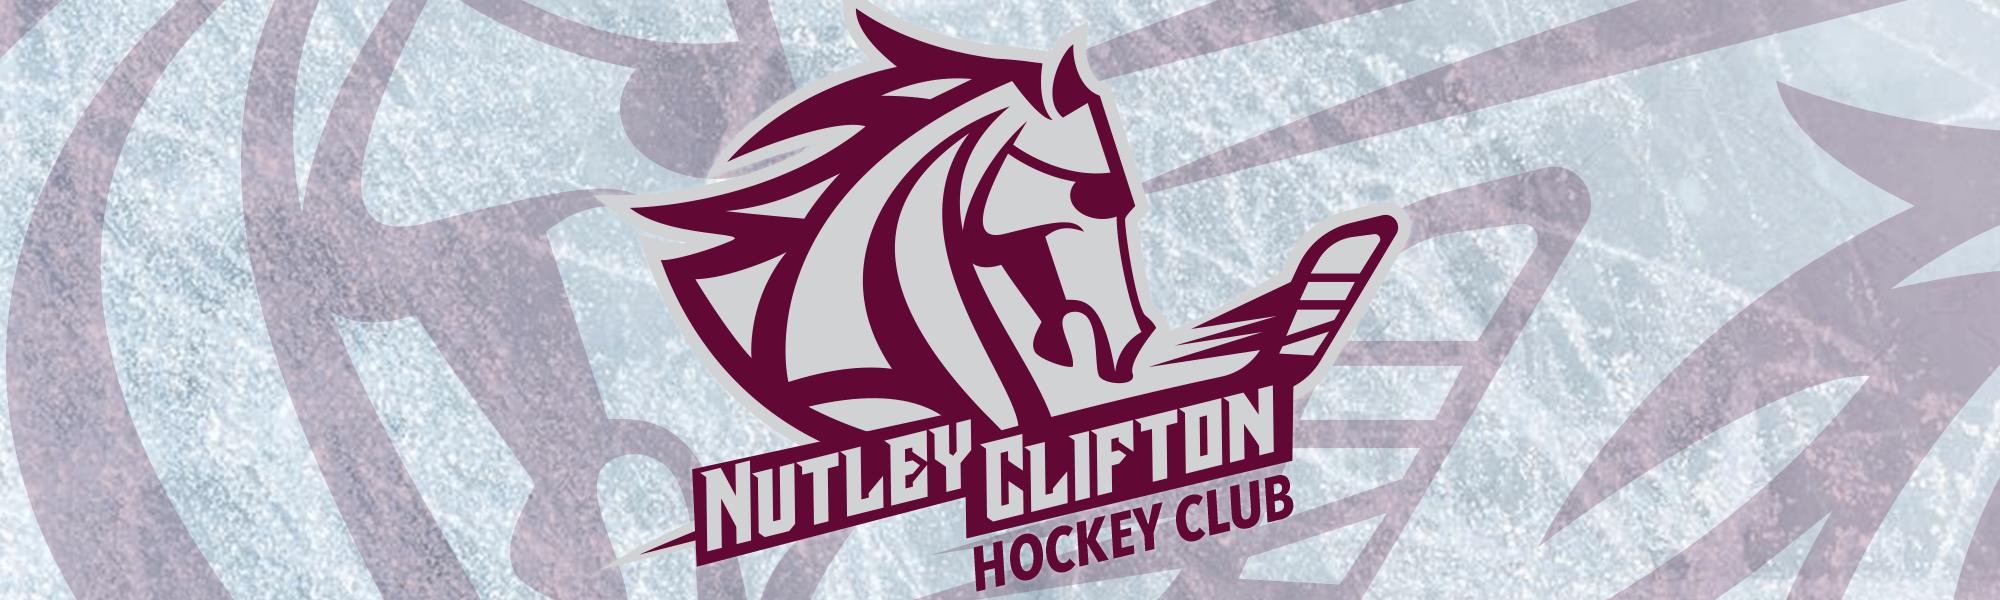 Nutley clifton website banner